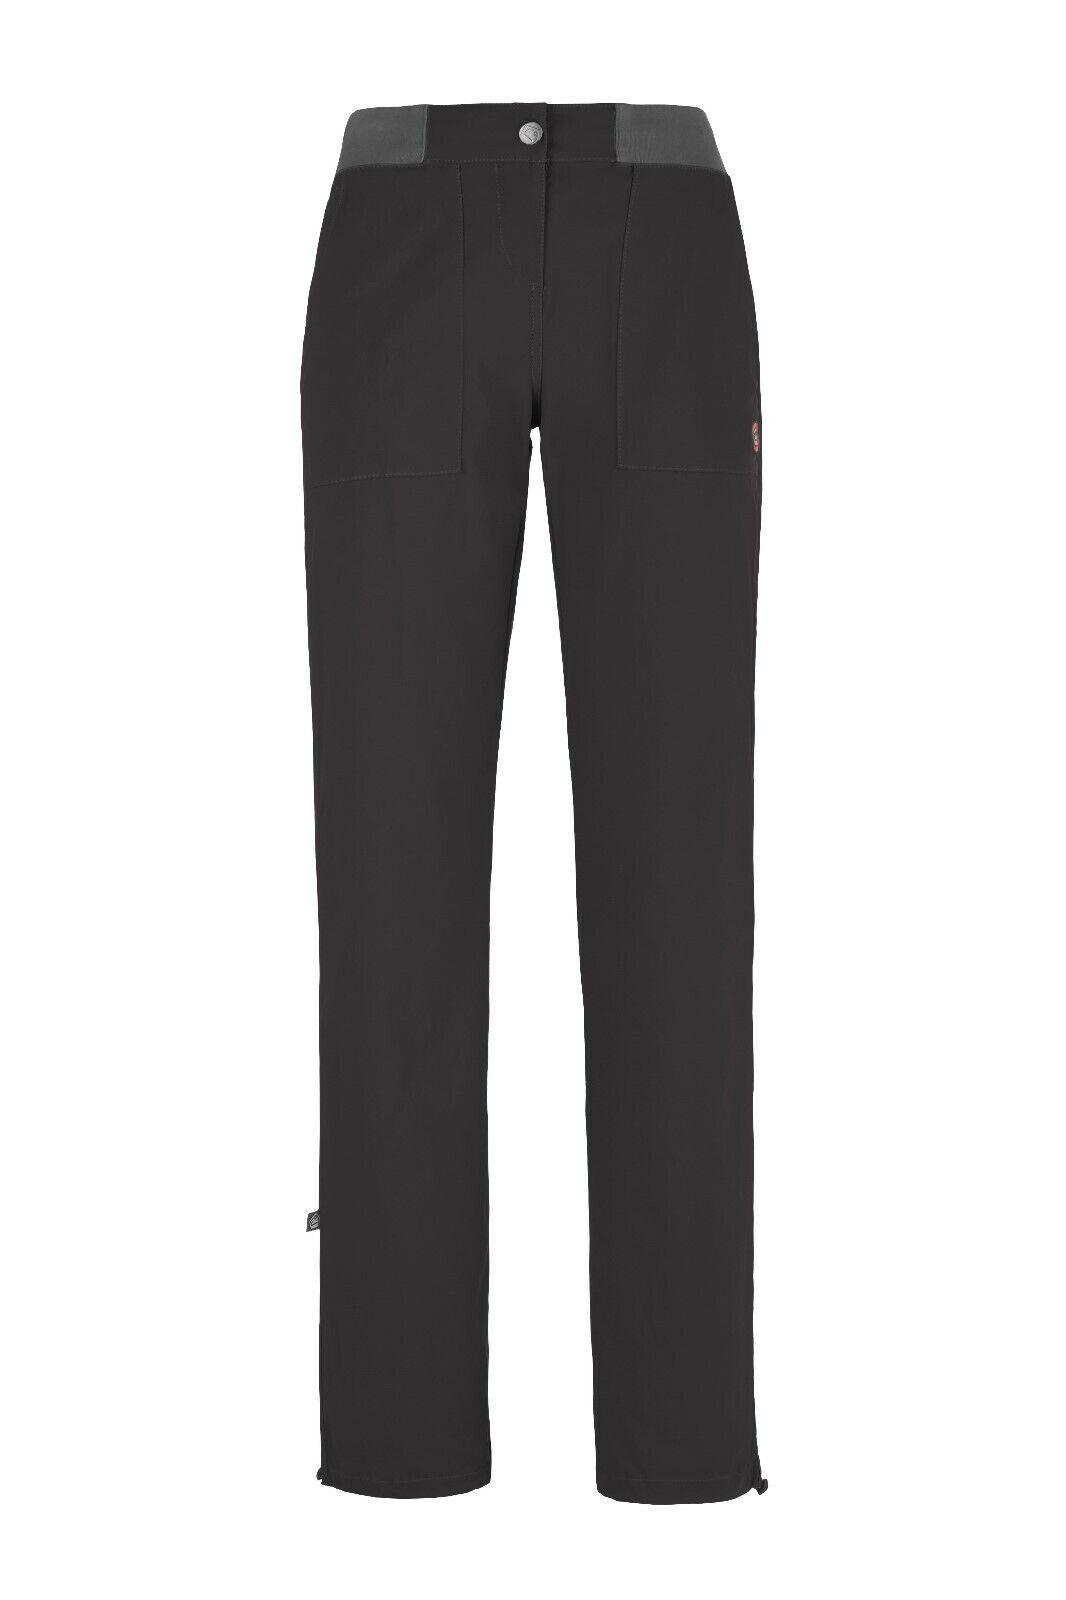 E9 Fiondina Elástico Pantalones Mujer Pantalones para Escalar Boulderhose Hierro